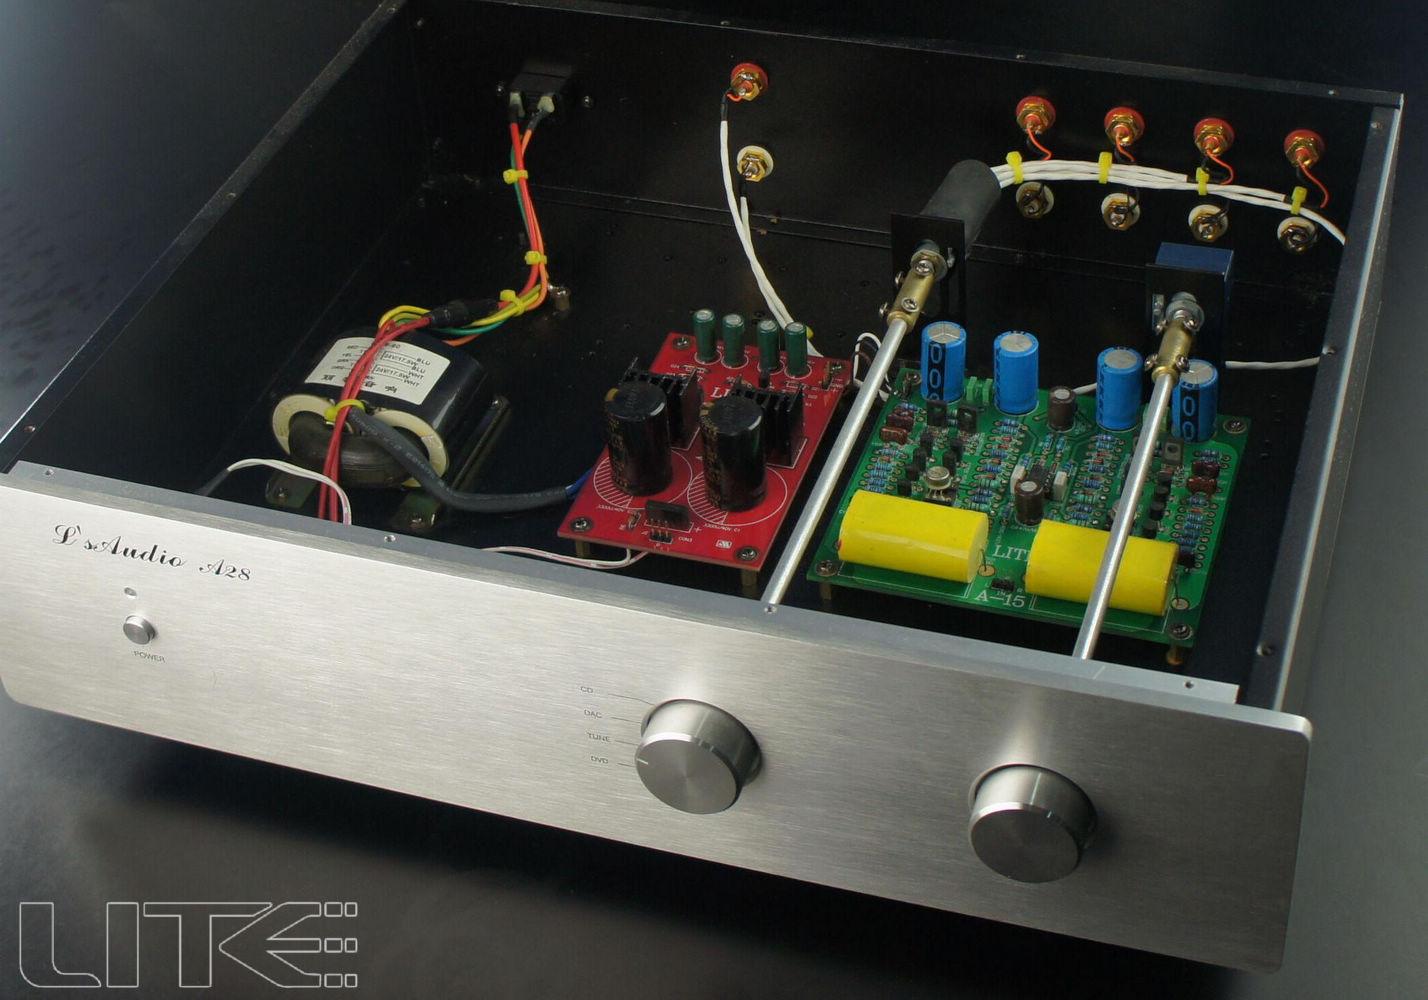 Lite Audio A15 Mark Levinson 20.5 transistor LM394 Preamplifier